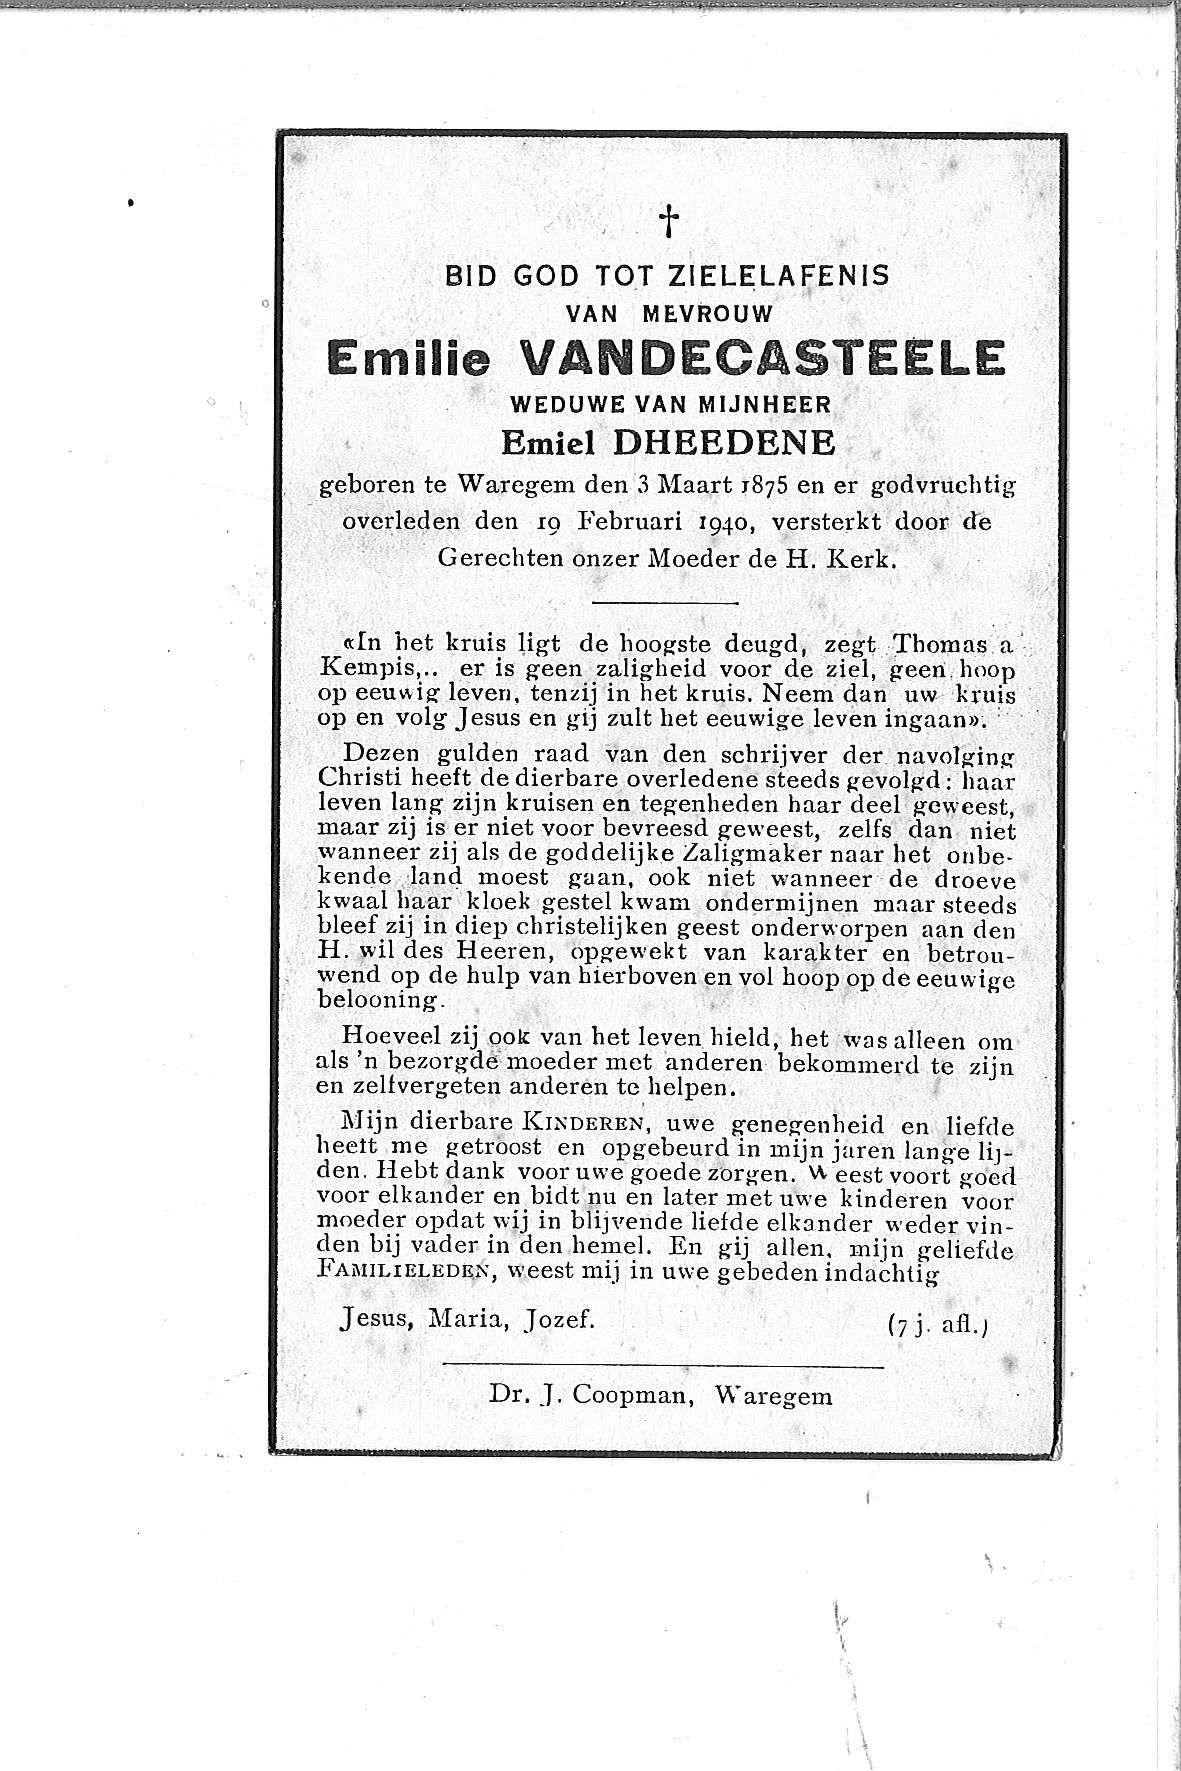 Emilie(1940)20140113111440_00030.jpg